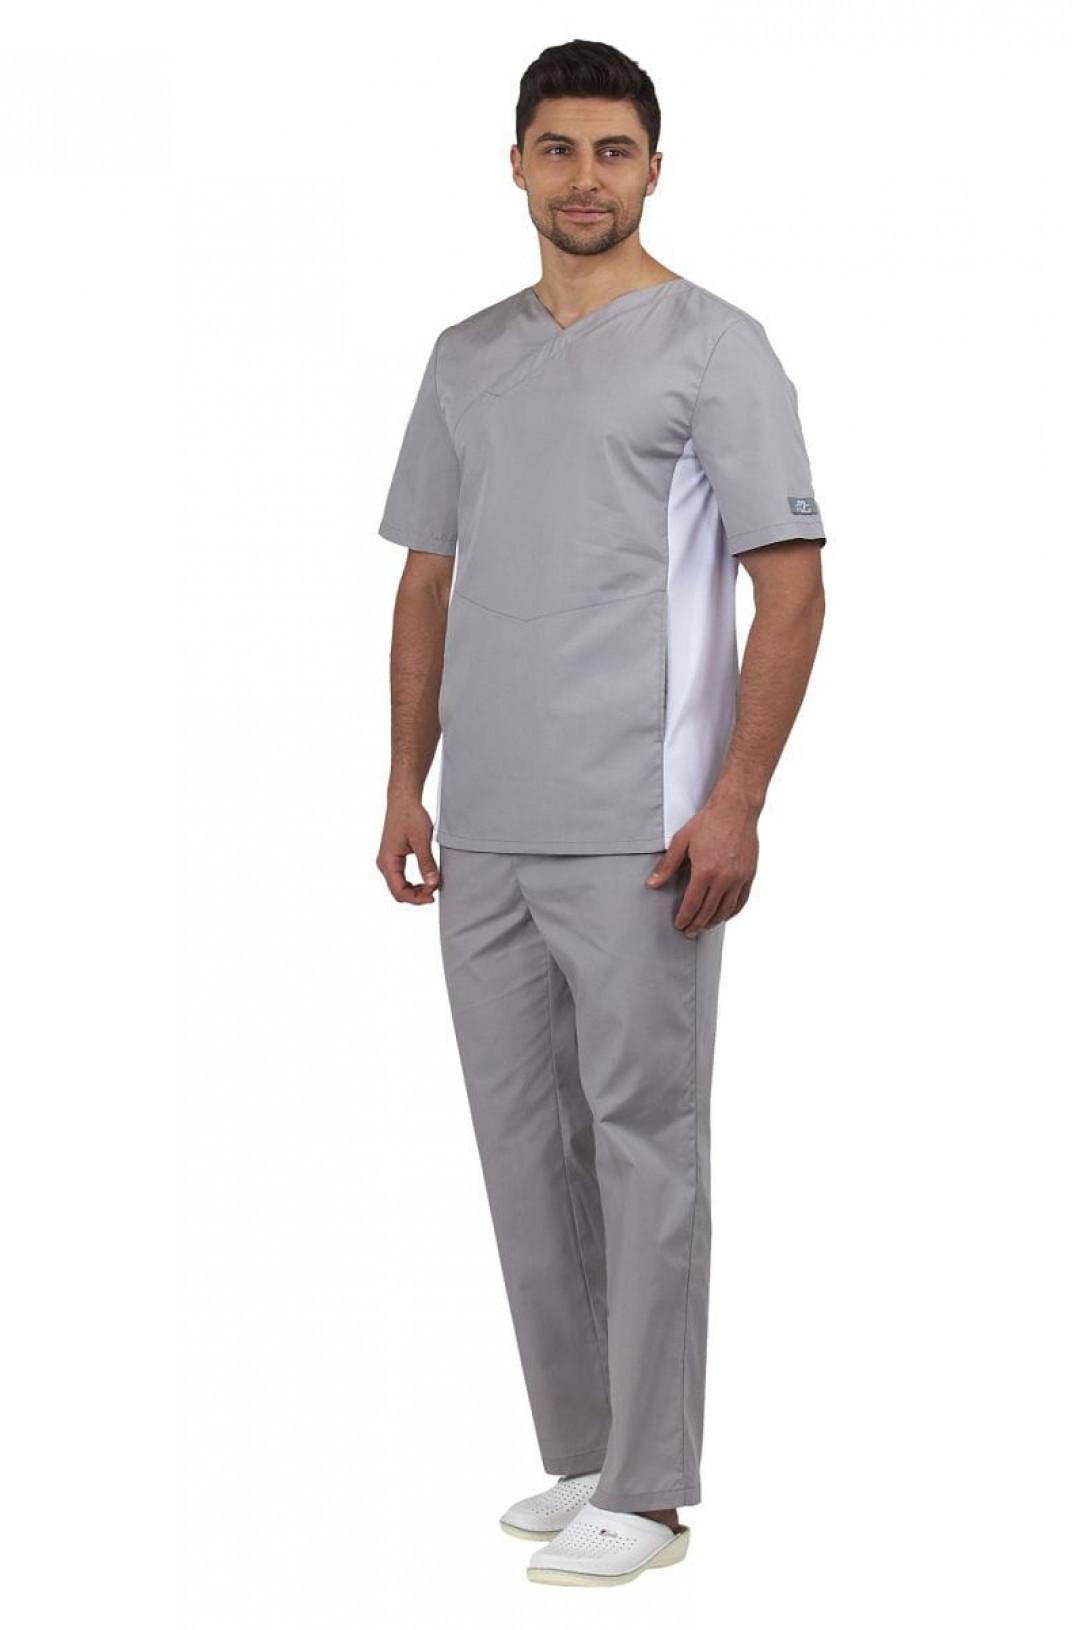 Брюки медицинские мужские Эскулап (серый, тиси)